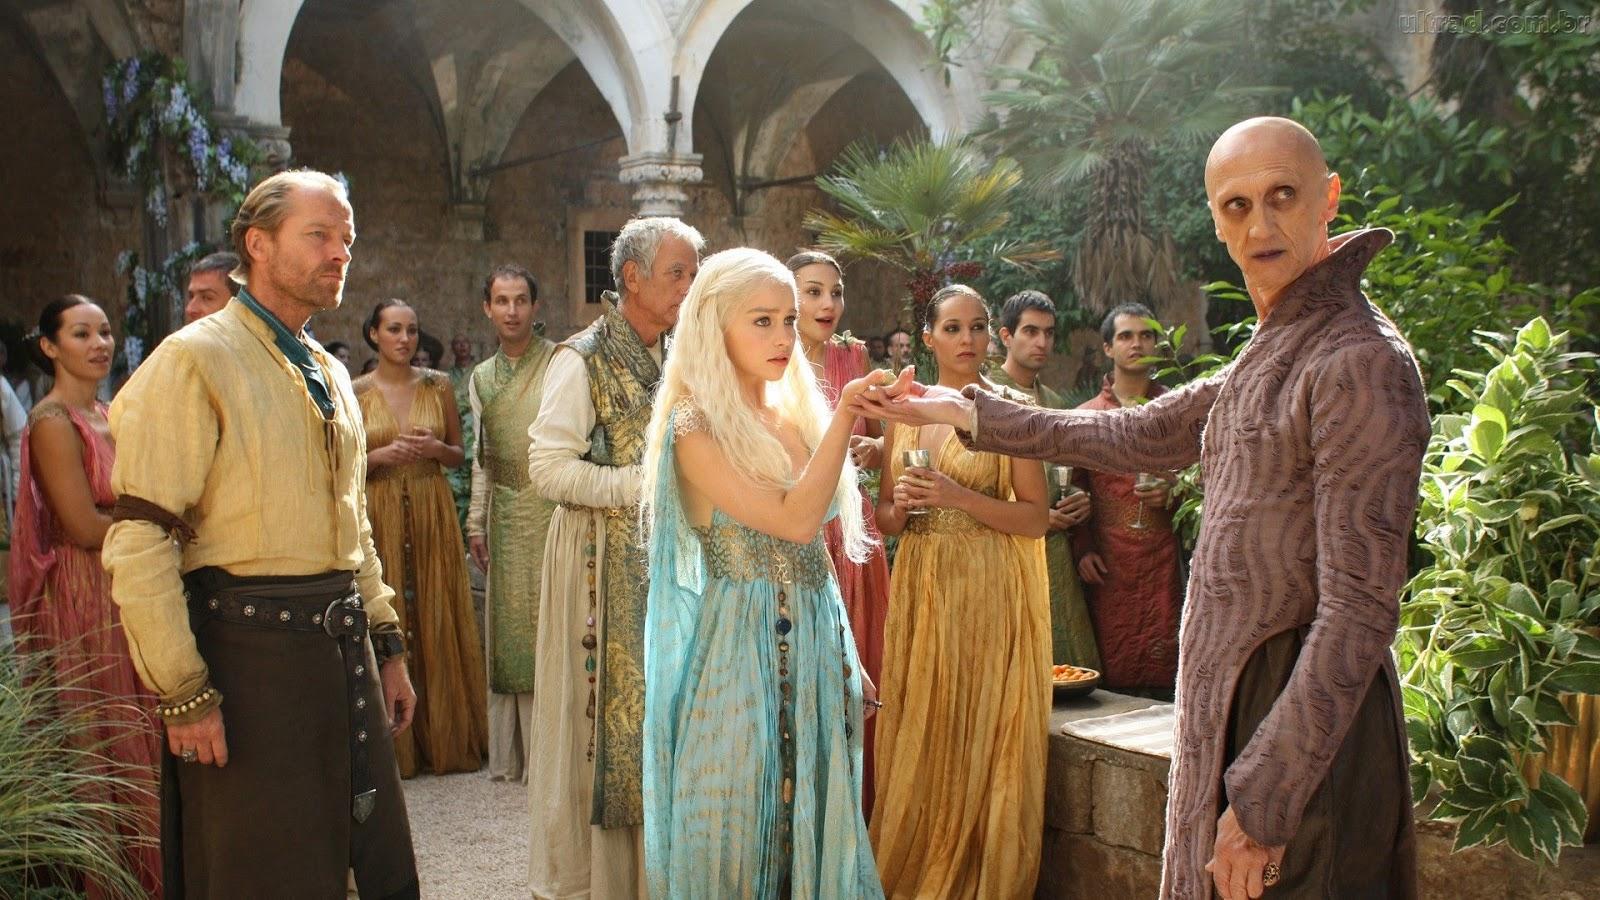 Game of Thrones Filming Locations in Croatia: Lokrum Island